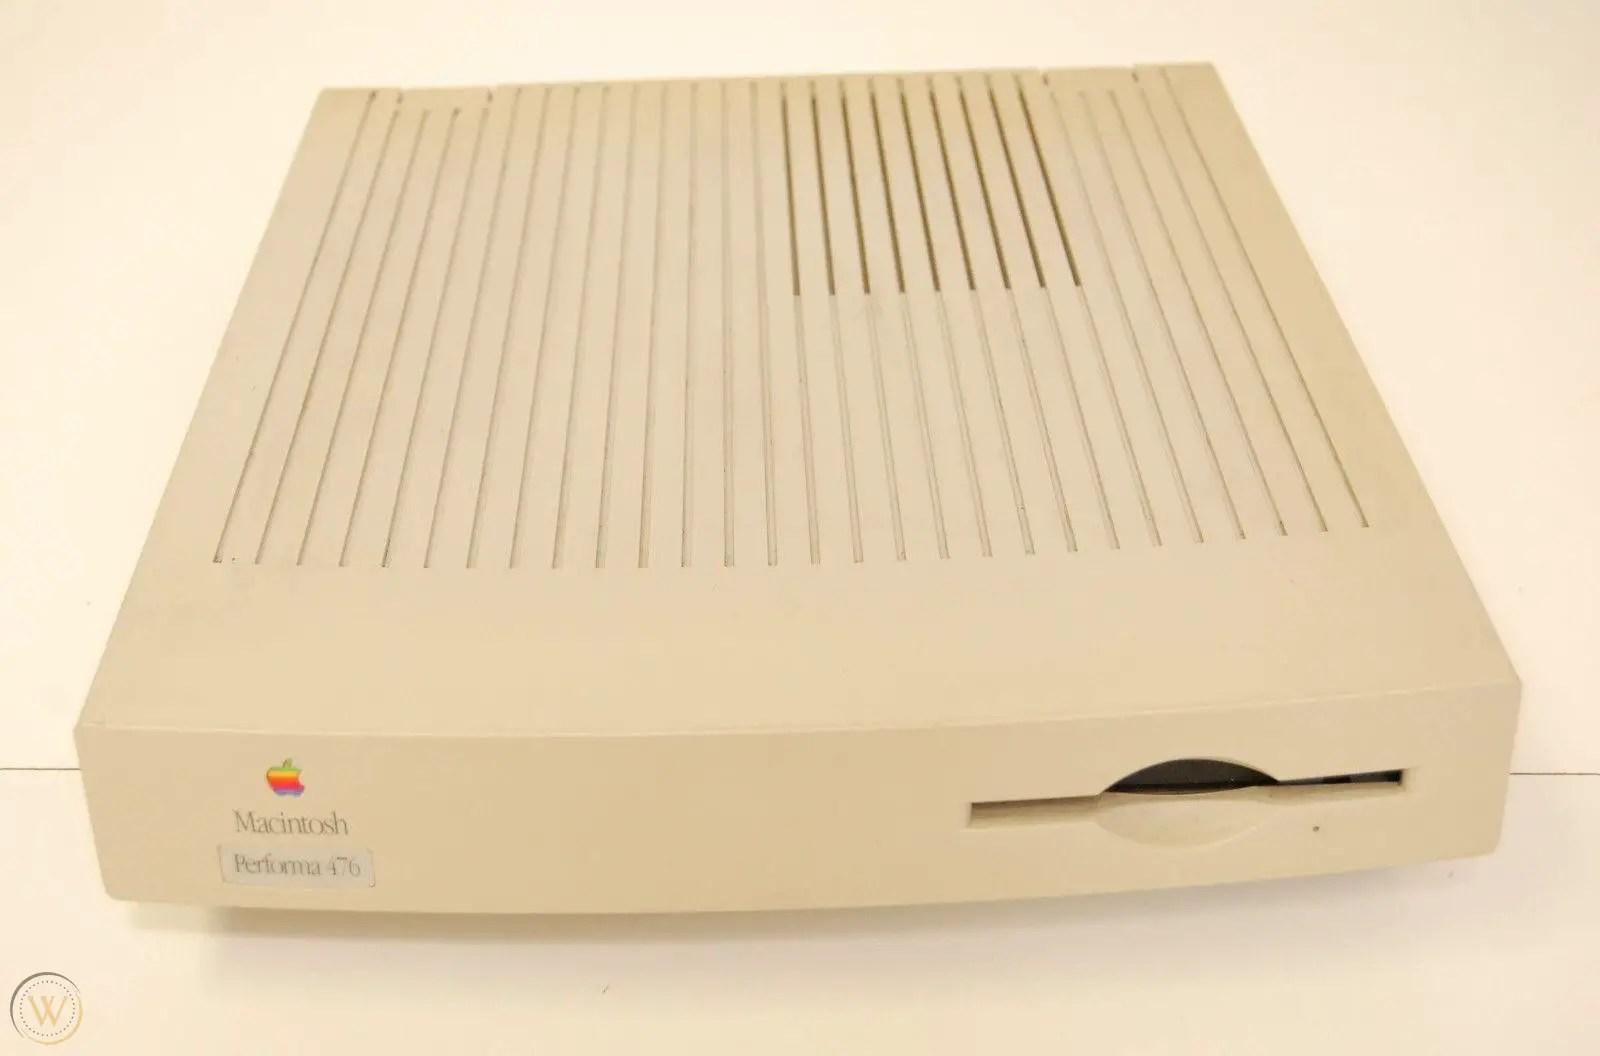 Macintosh Performa 476